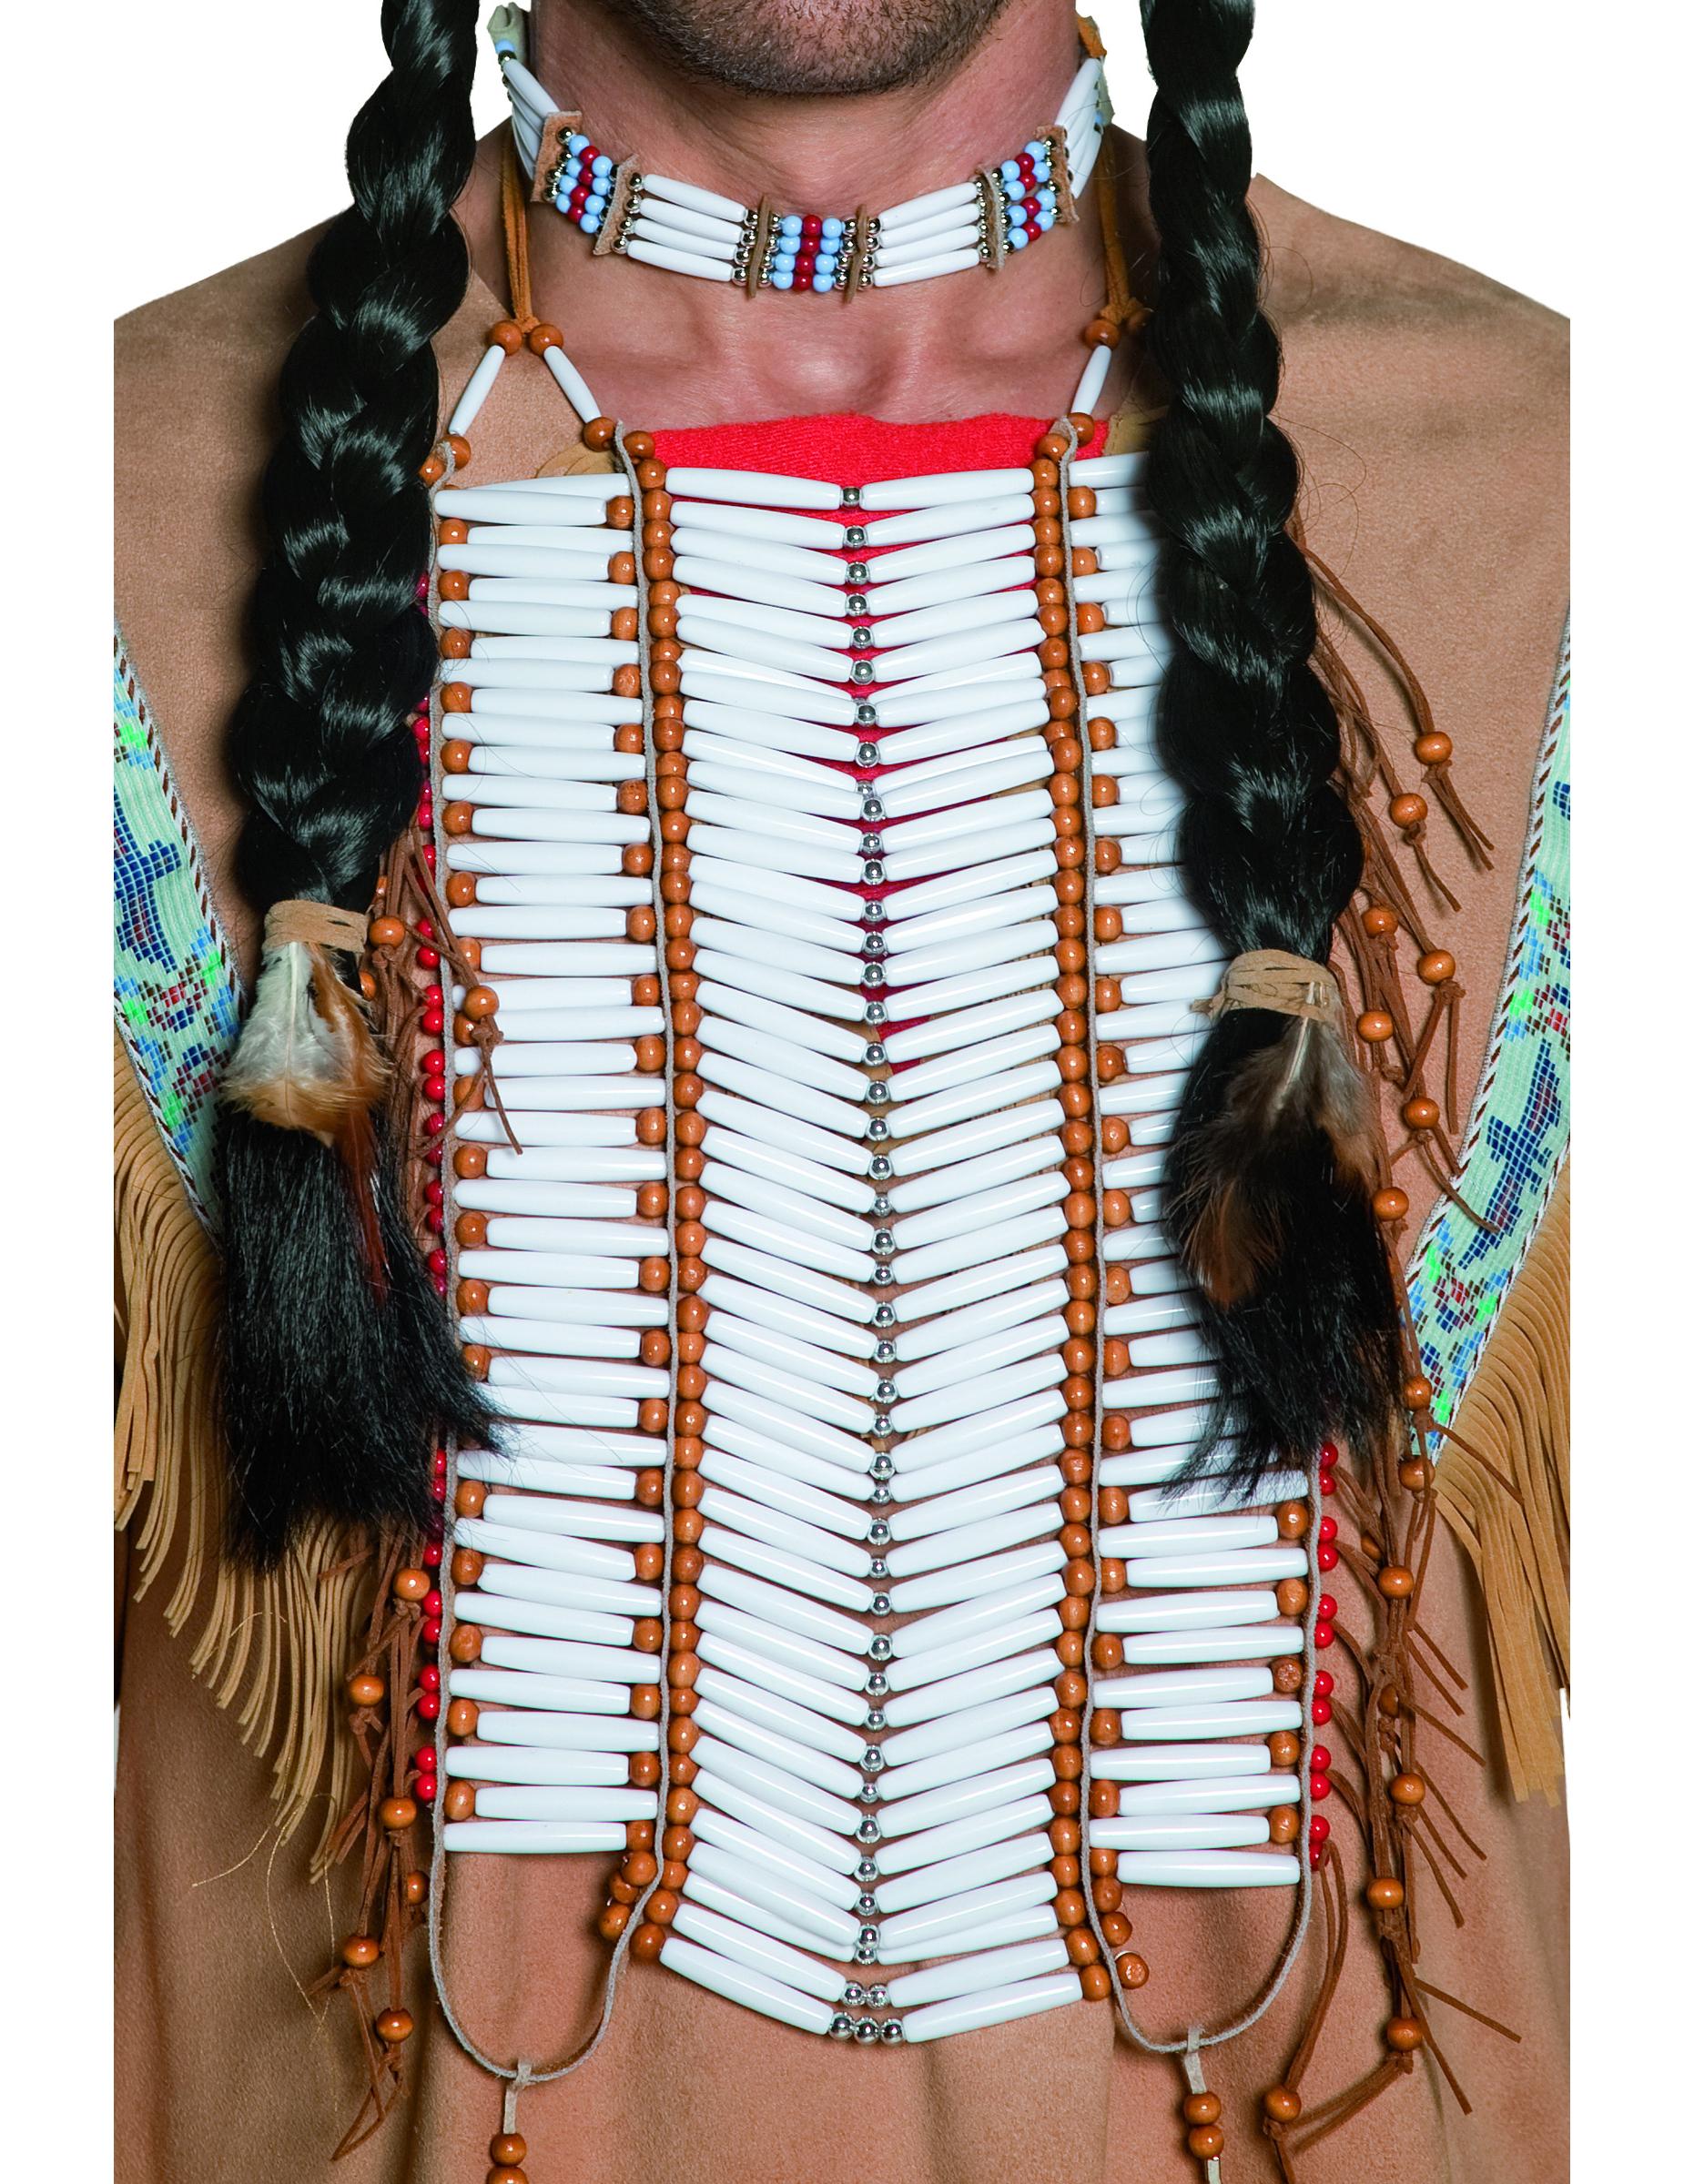 indianer halsschmuck weiss g nstige faschings accessoires zubeh r bei karneval megastore. Black Bedroom Furniture Sets. Home Design Ideas